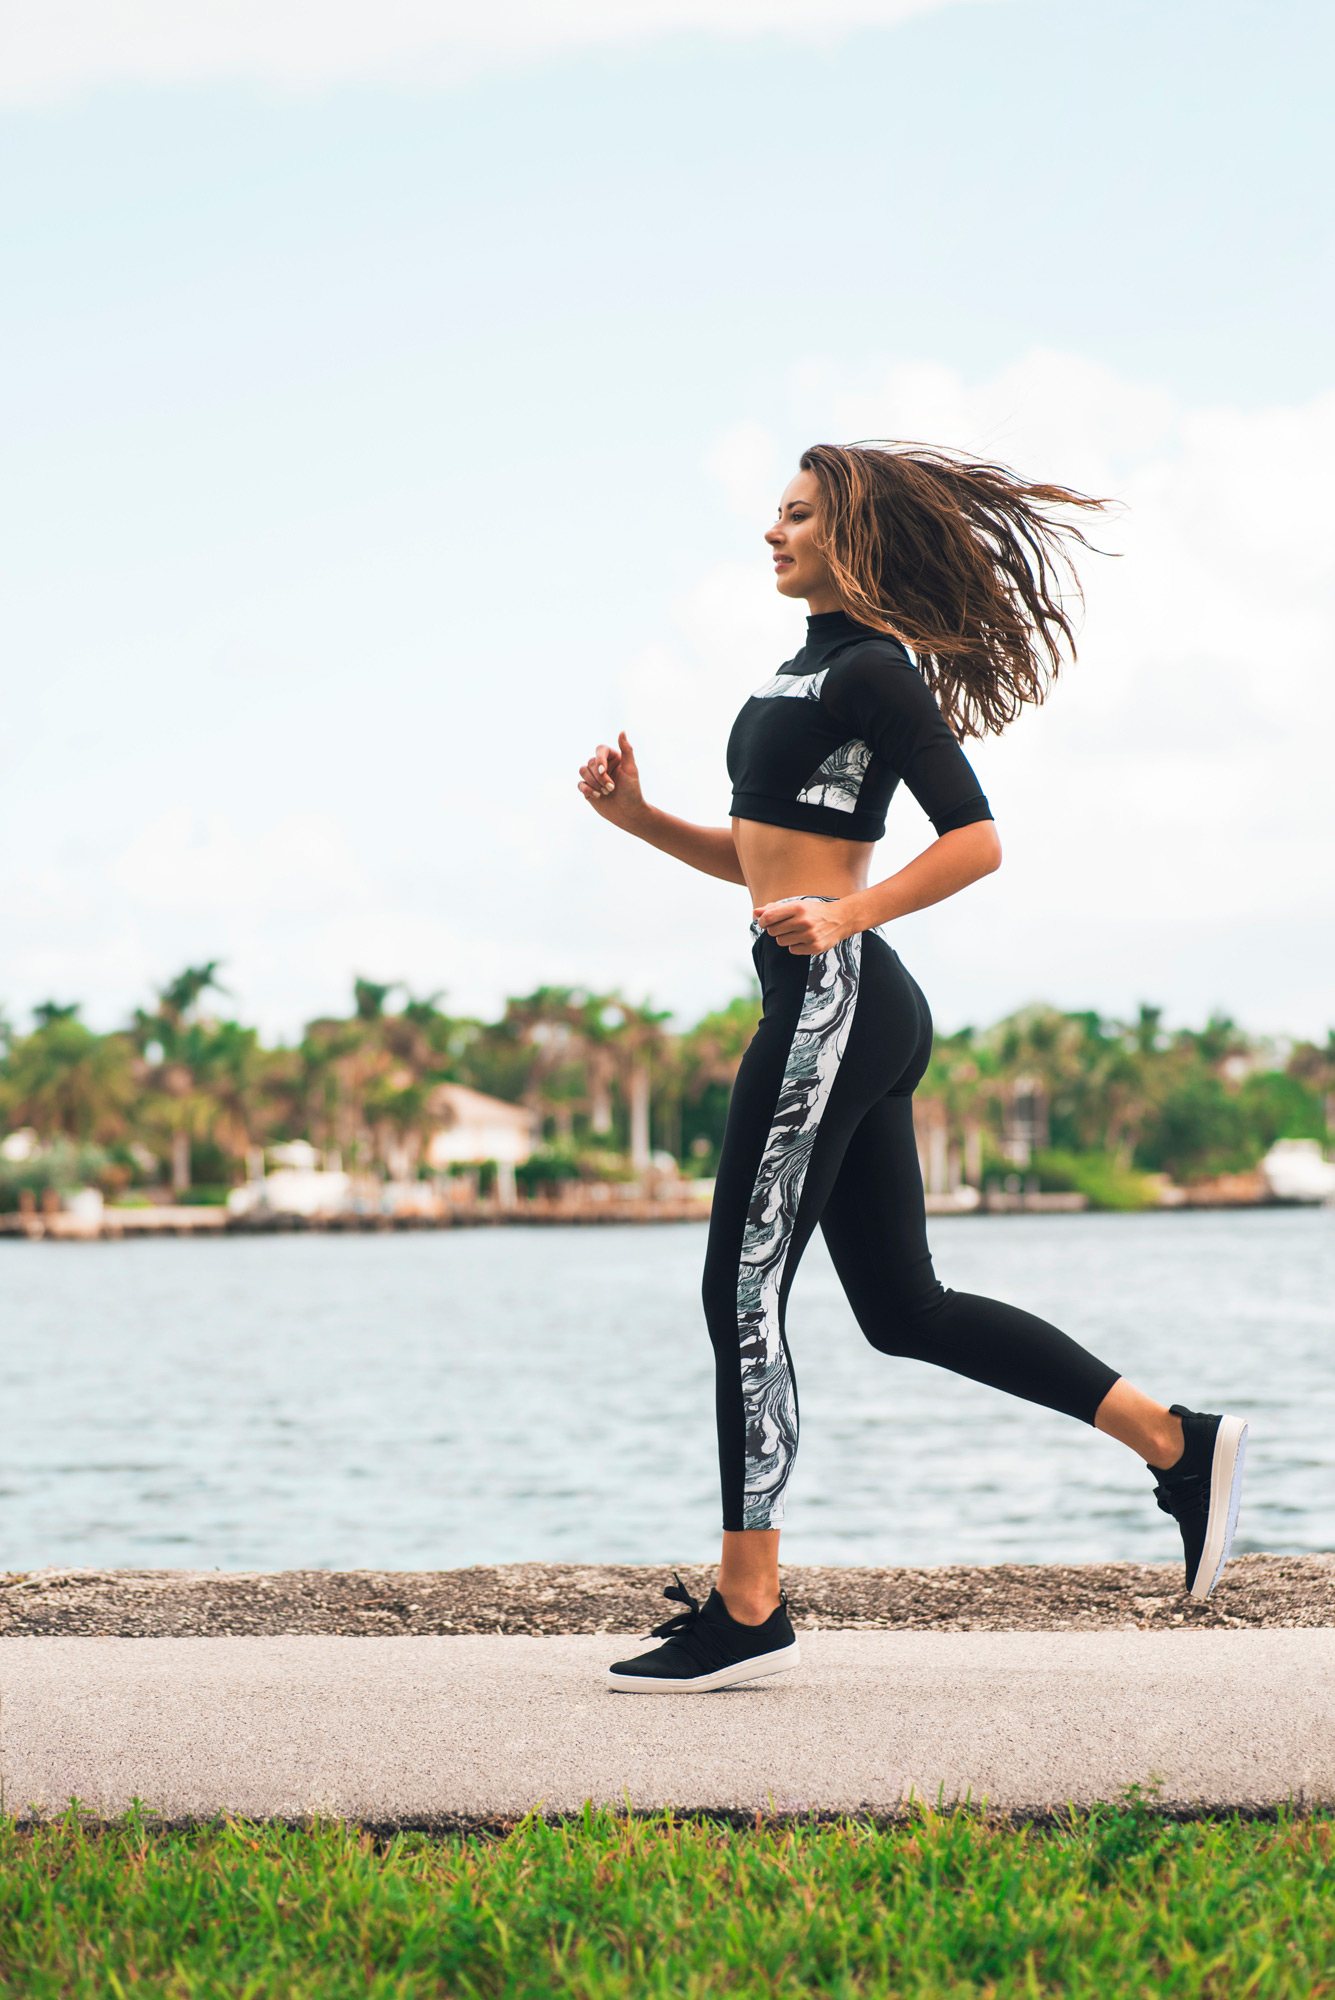 amora_beauty_studio_fashion_woman_model_sport_running_miami.jpg